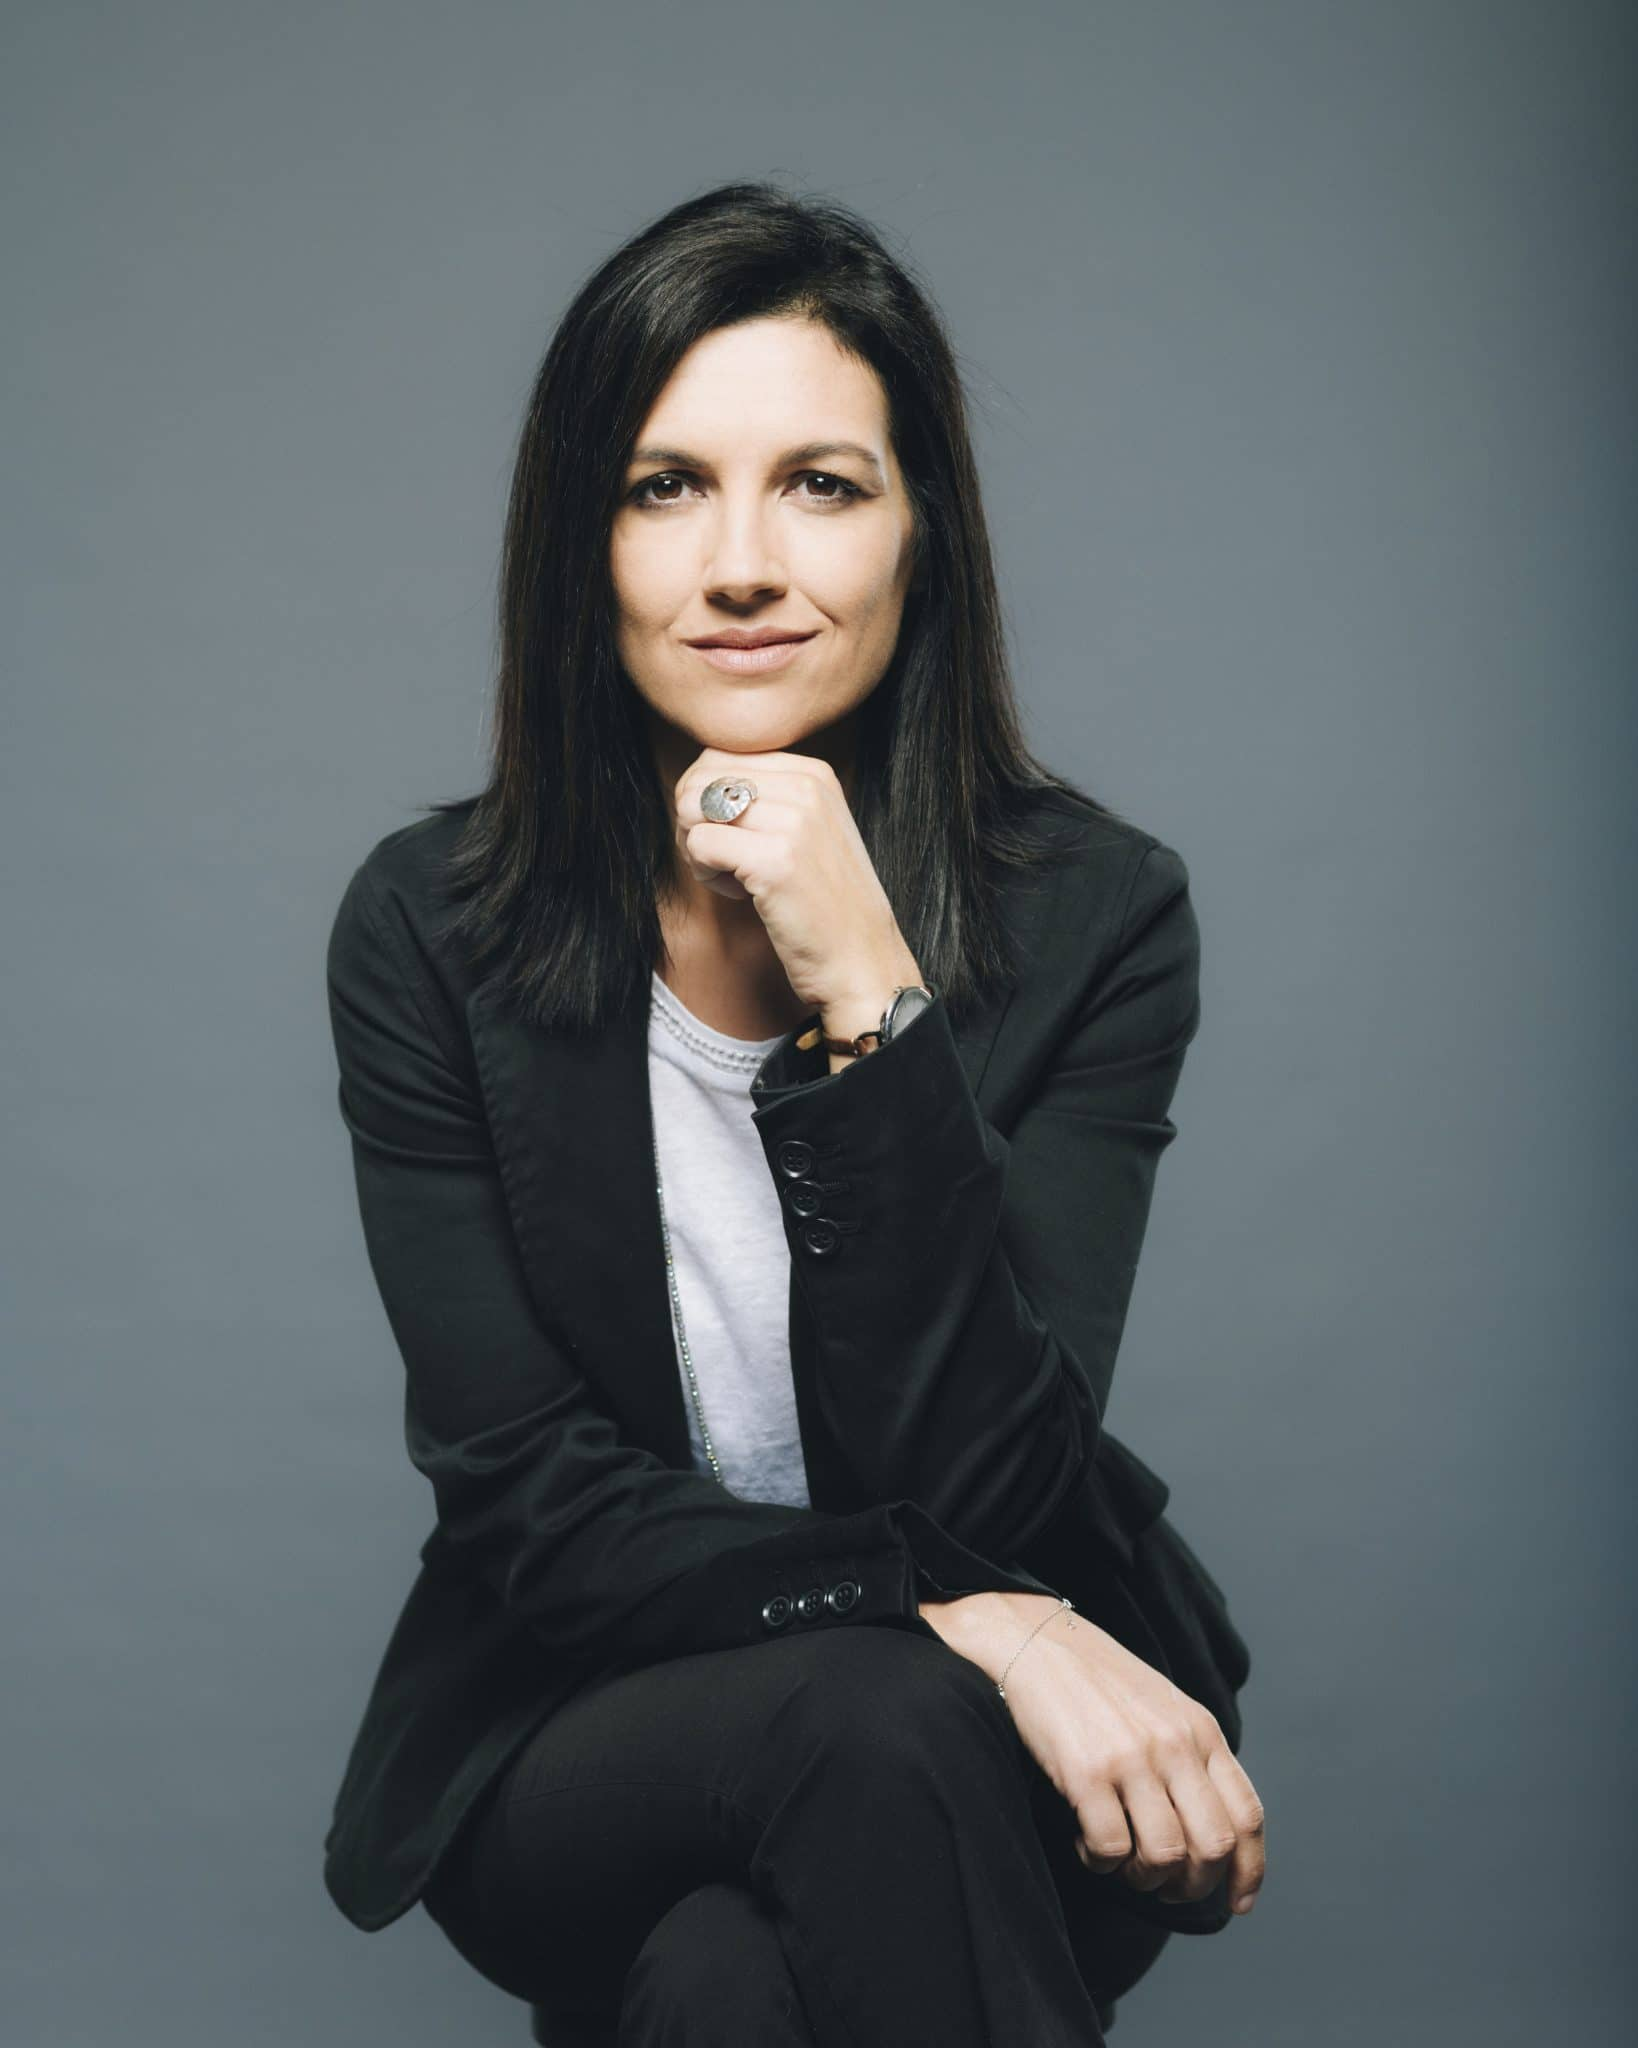 Lucie Rondelet